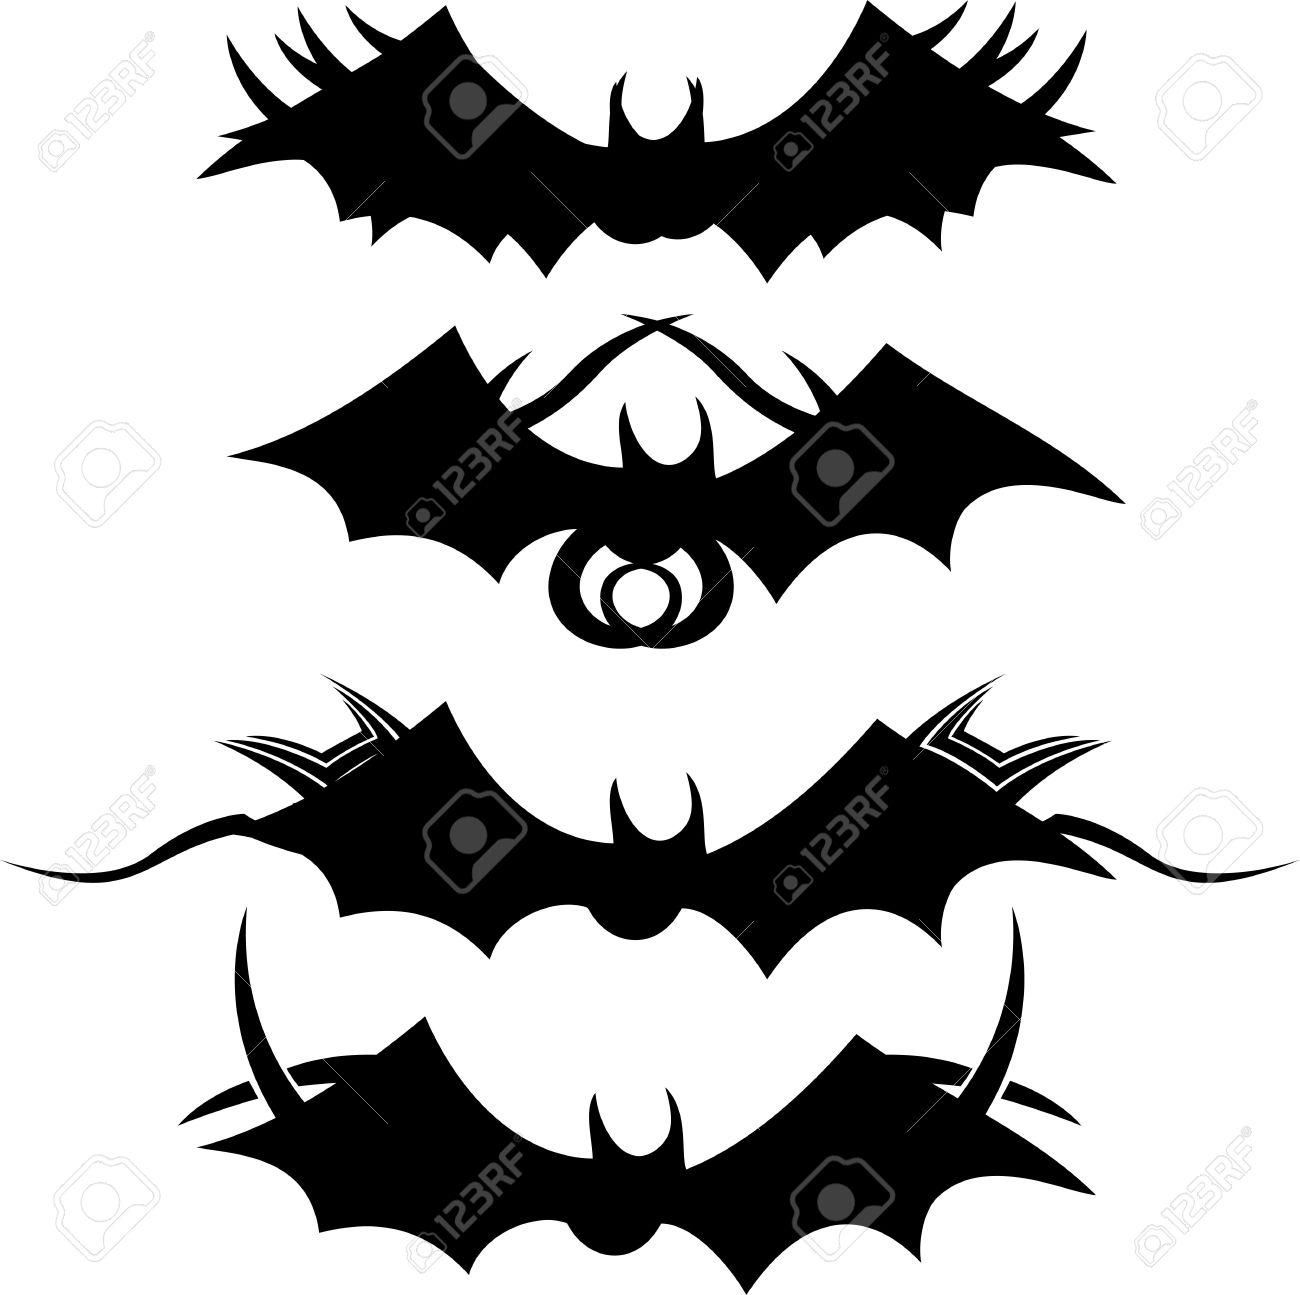 543020cd7 Tribal Bats Royalty Free Cliparts, Vectors, And Stock Illustration ...